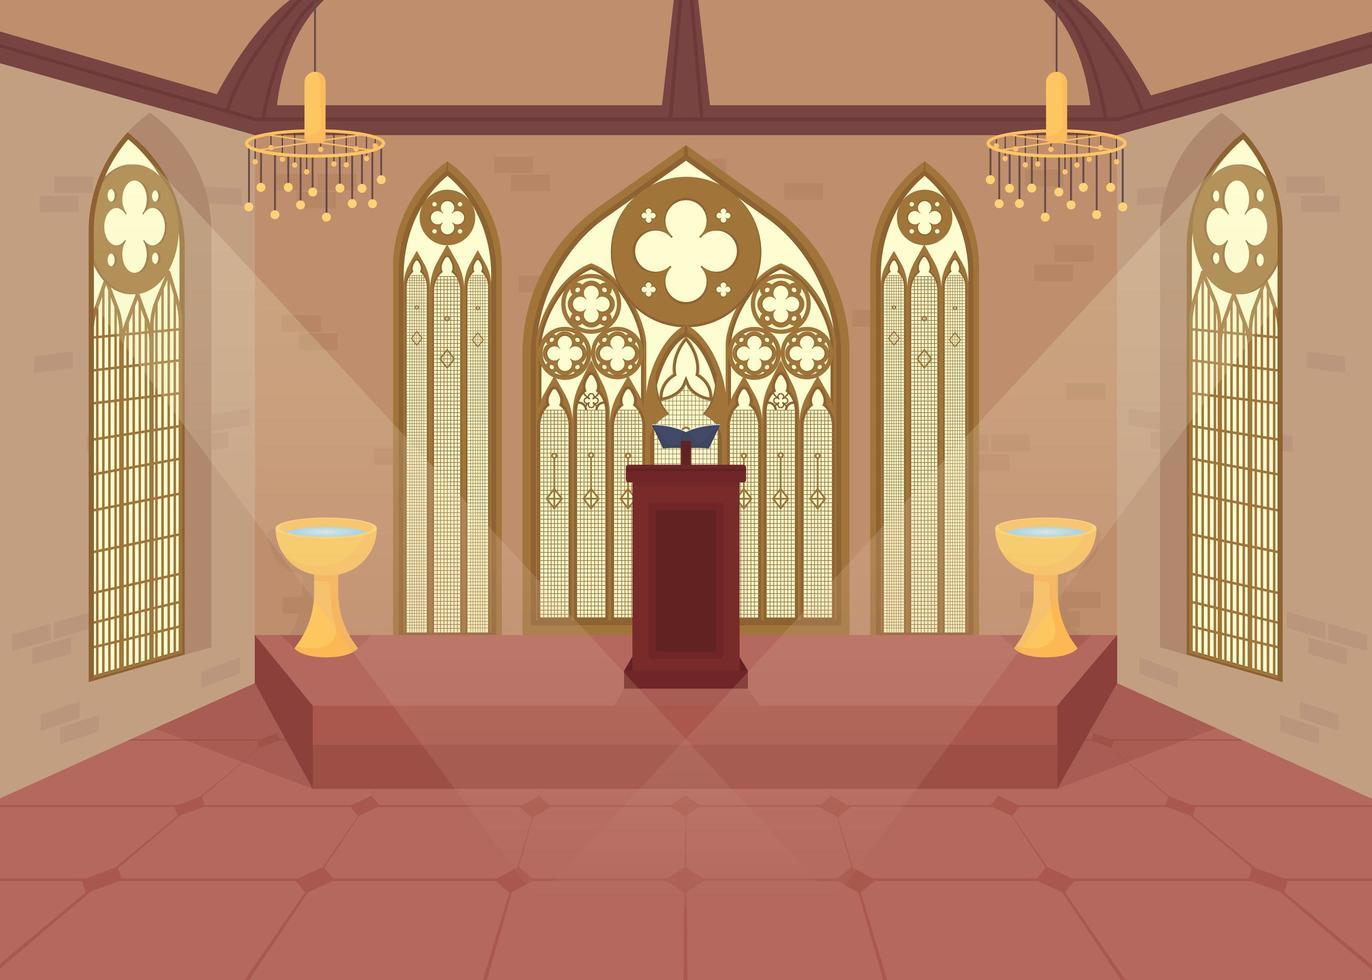 ajuste de la iglesia plana vector